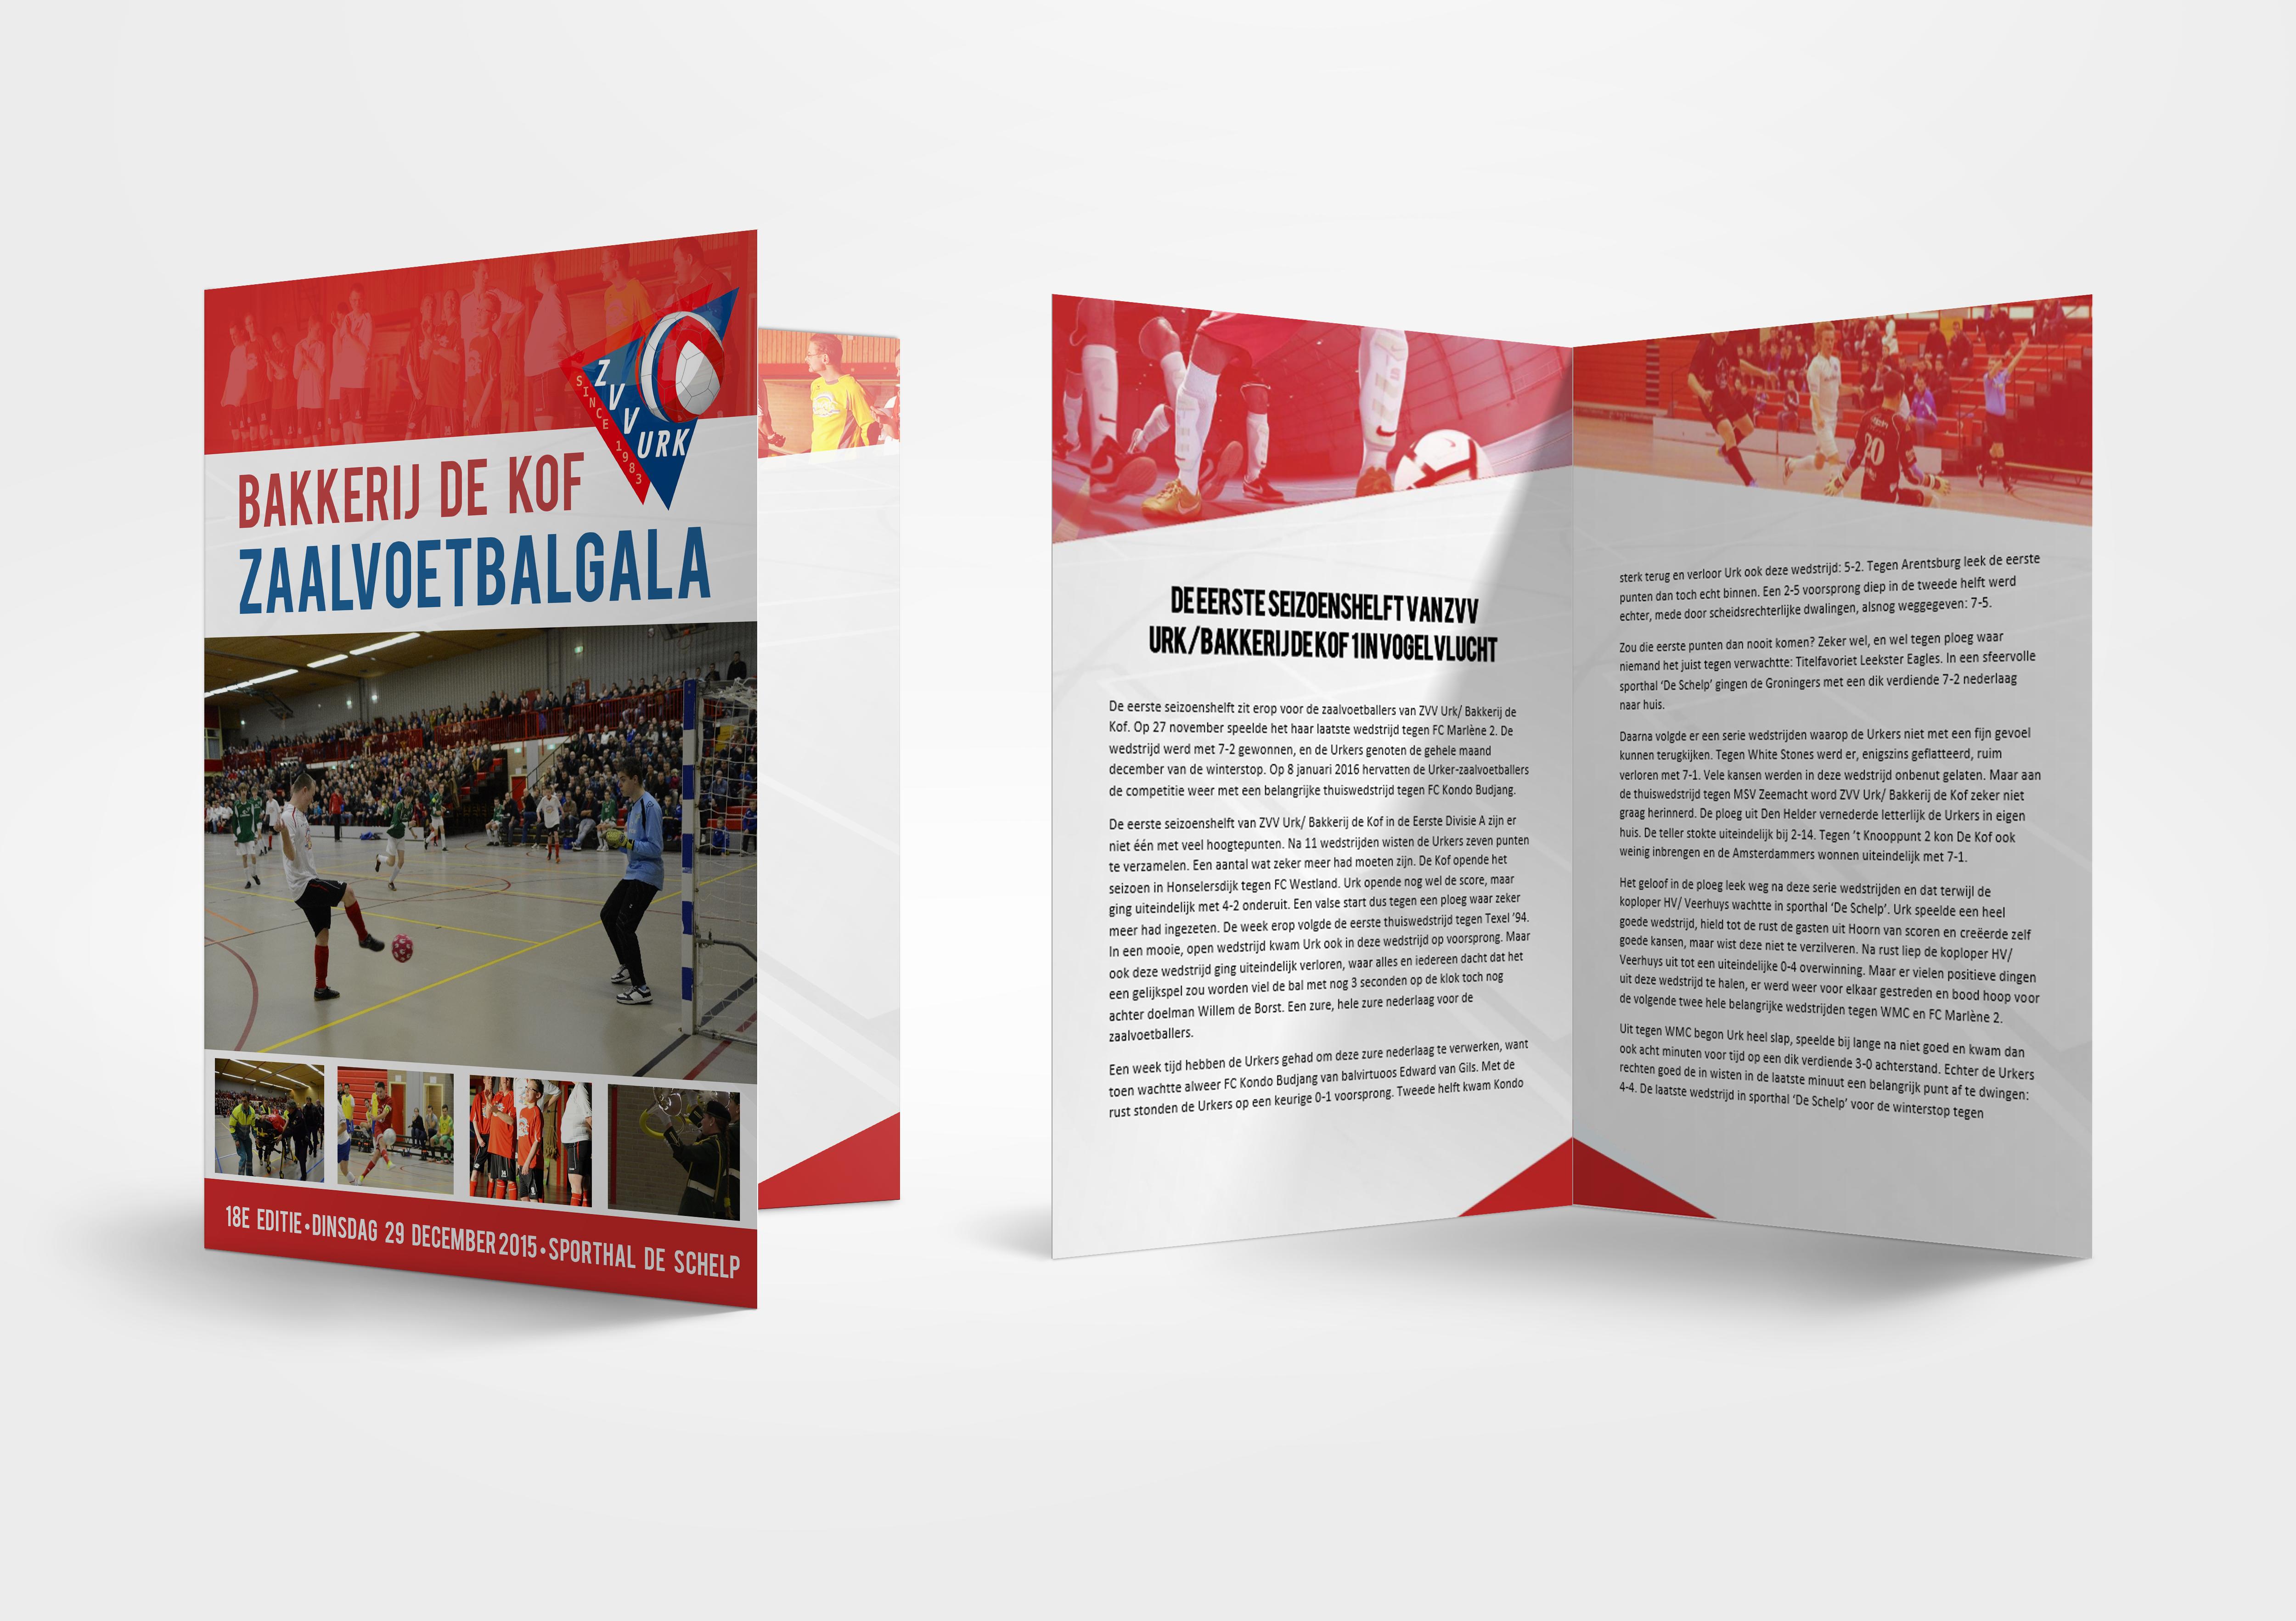 Wedstrijdboekje Zaalvoetbalgala ZVVU